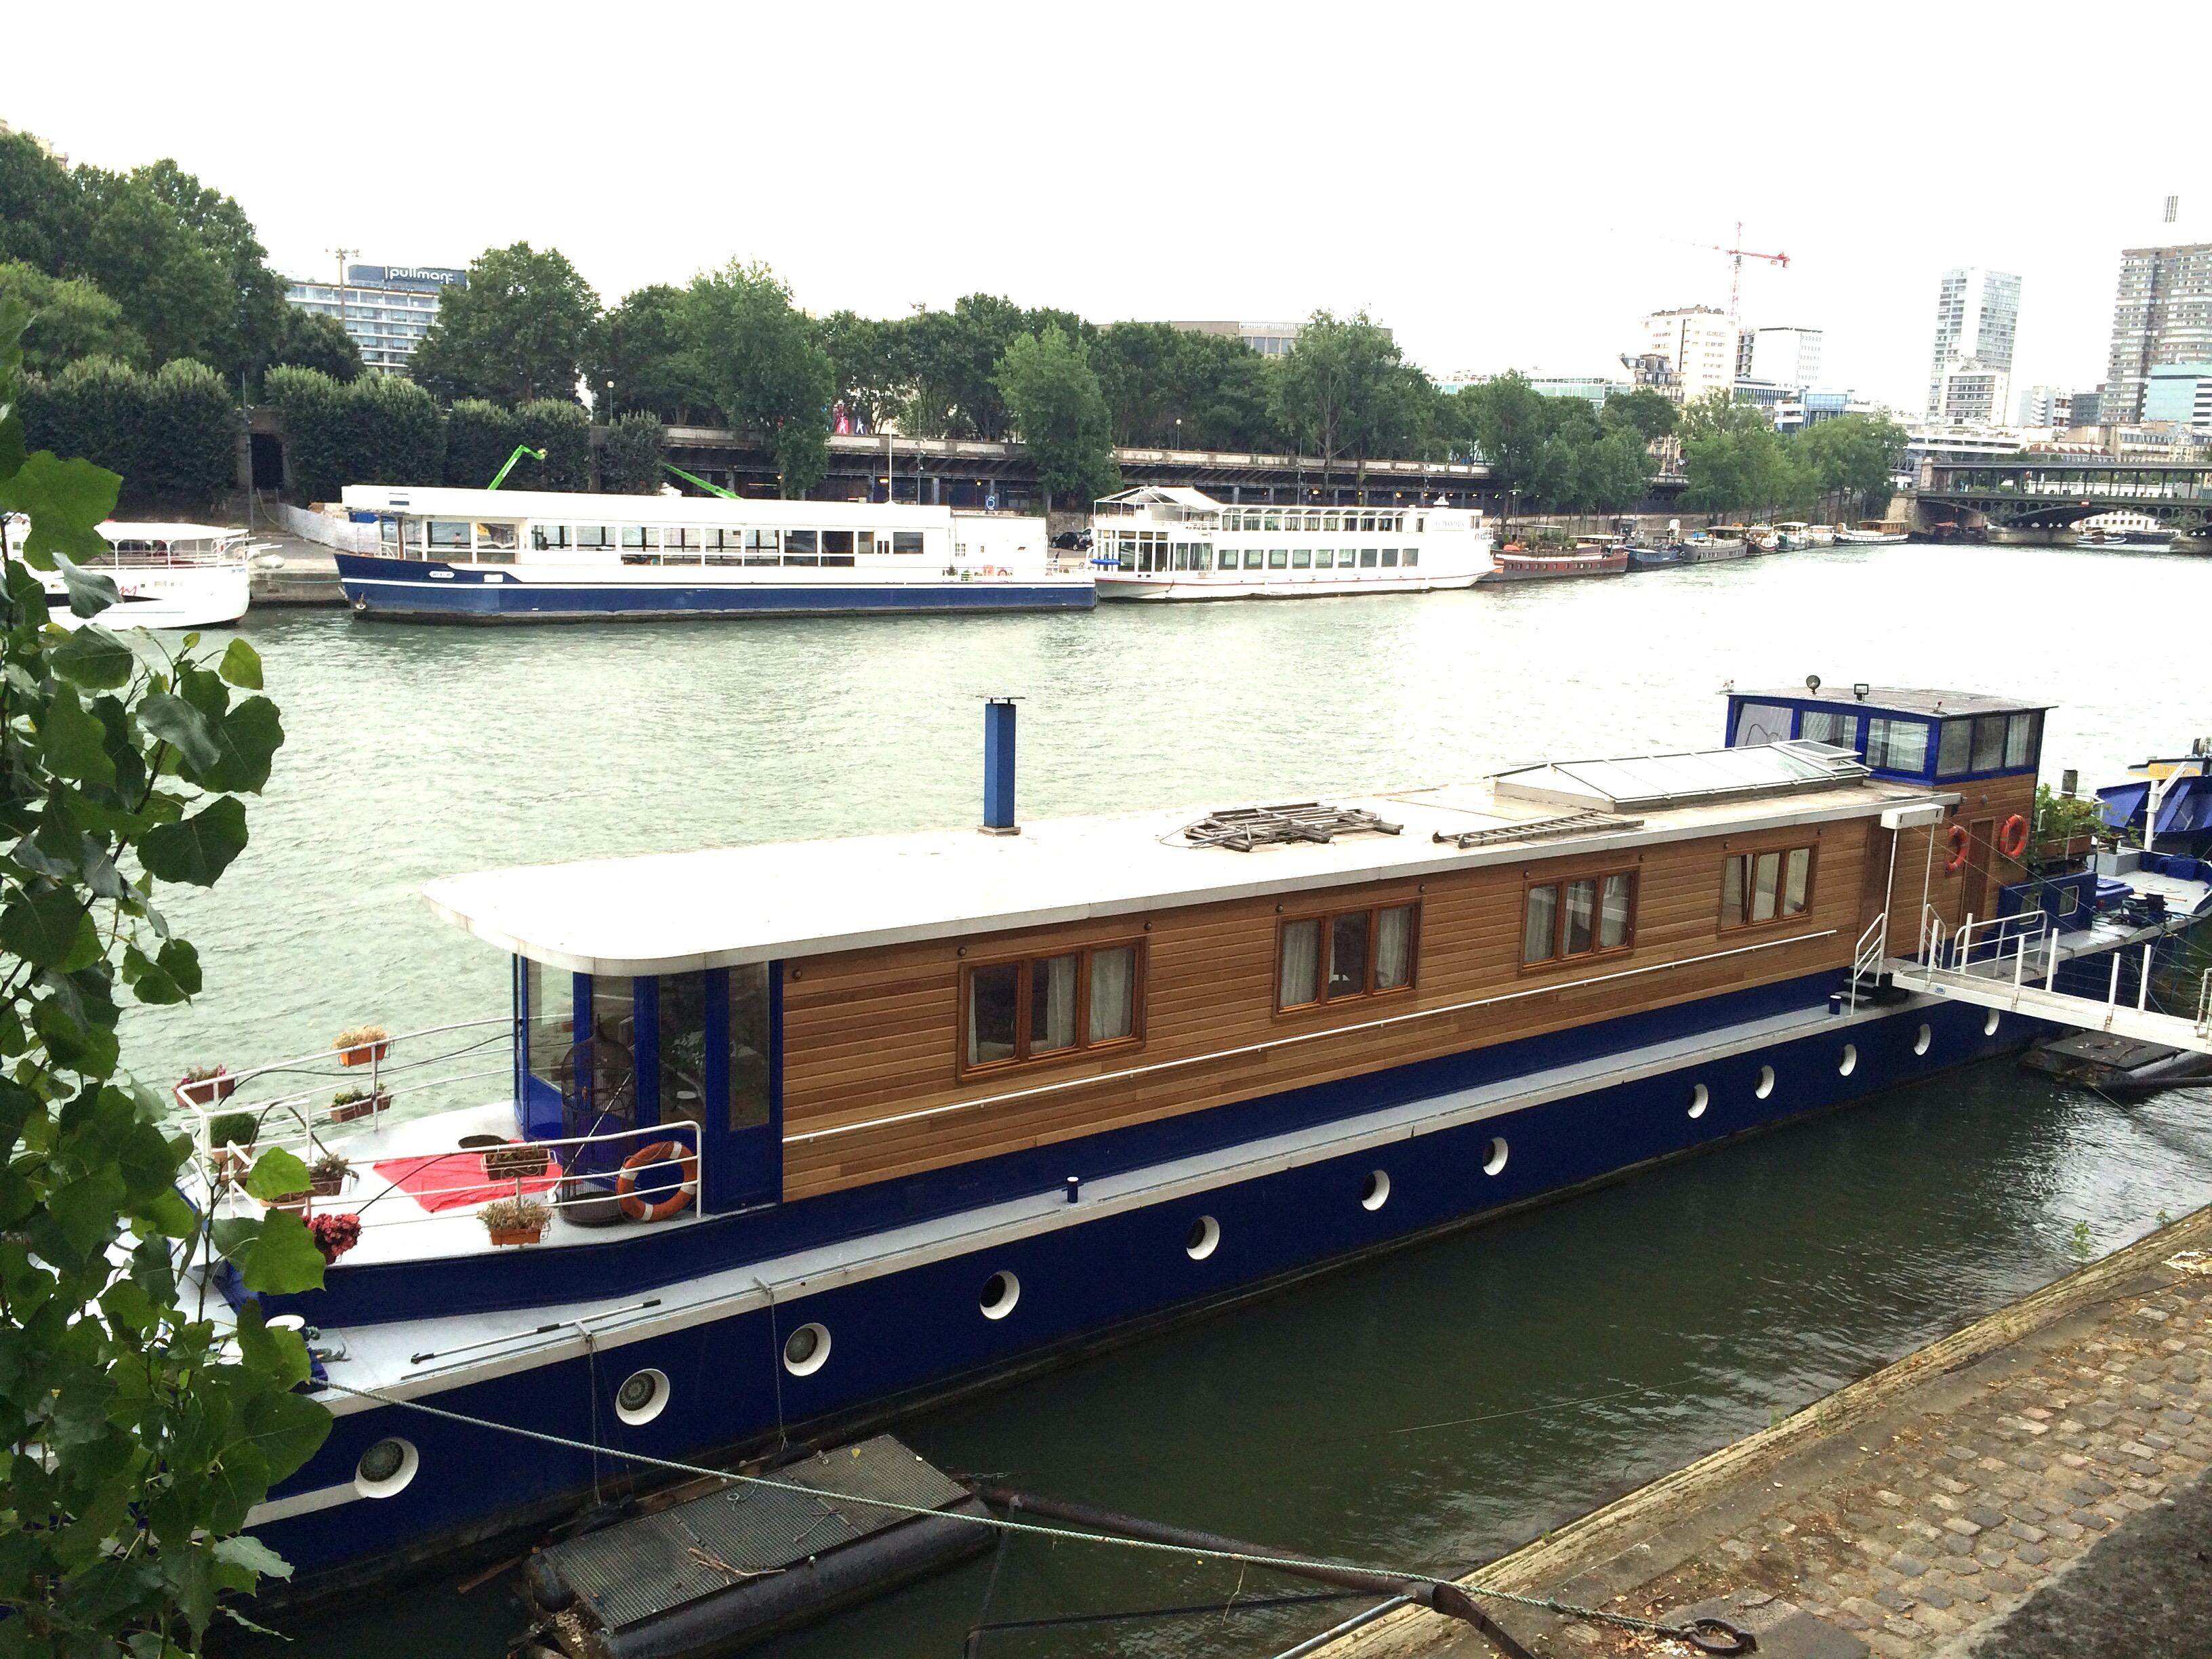 River boat in Paris